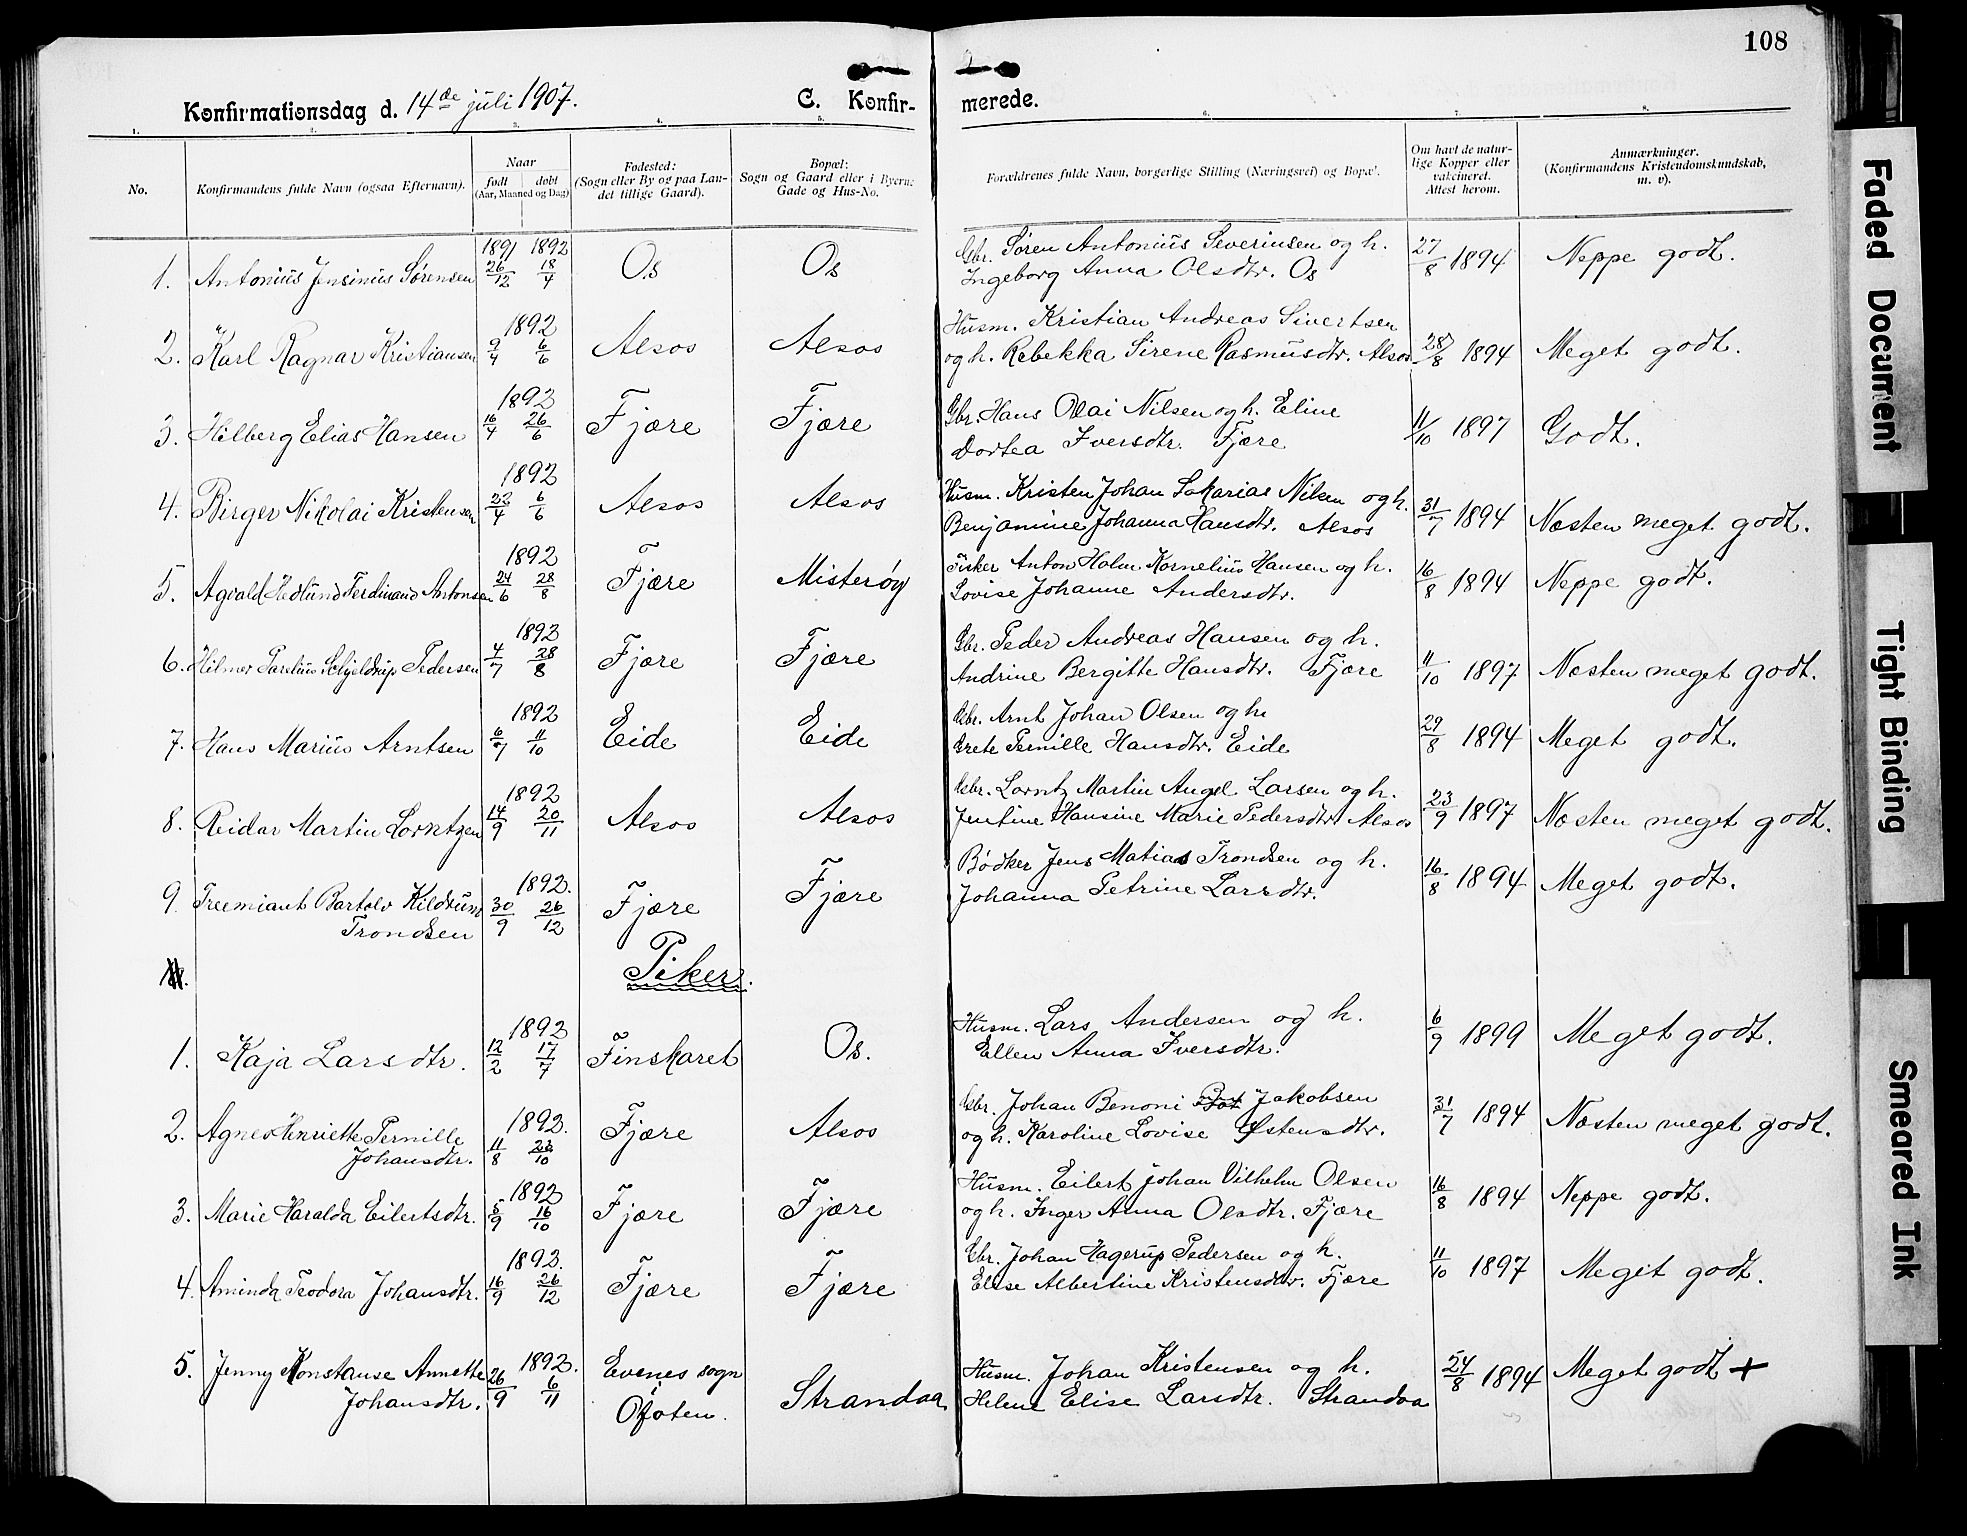 SAT, Ministerialprotokoller, klokkerbøker og fødselsregistre - Nordland, 803/L0077: Klokkerbok nr. 803C04, 1897-1930, s. 108